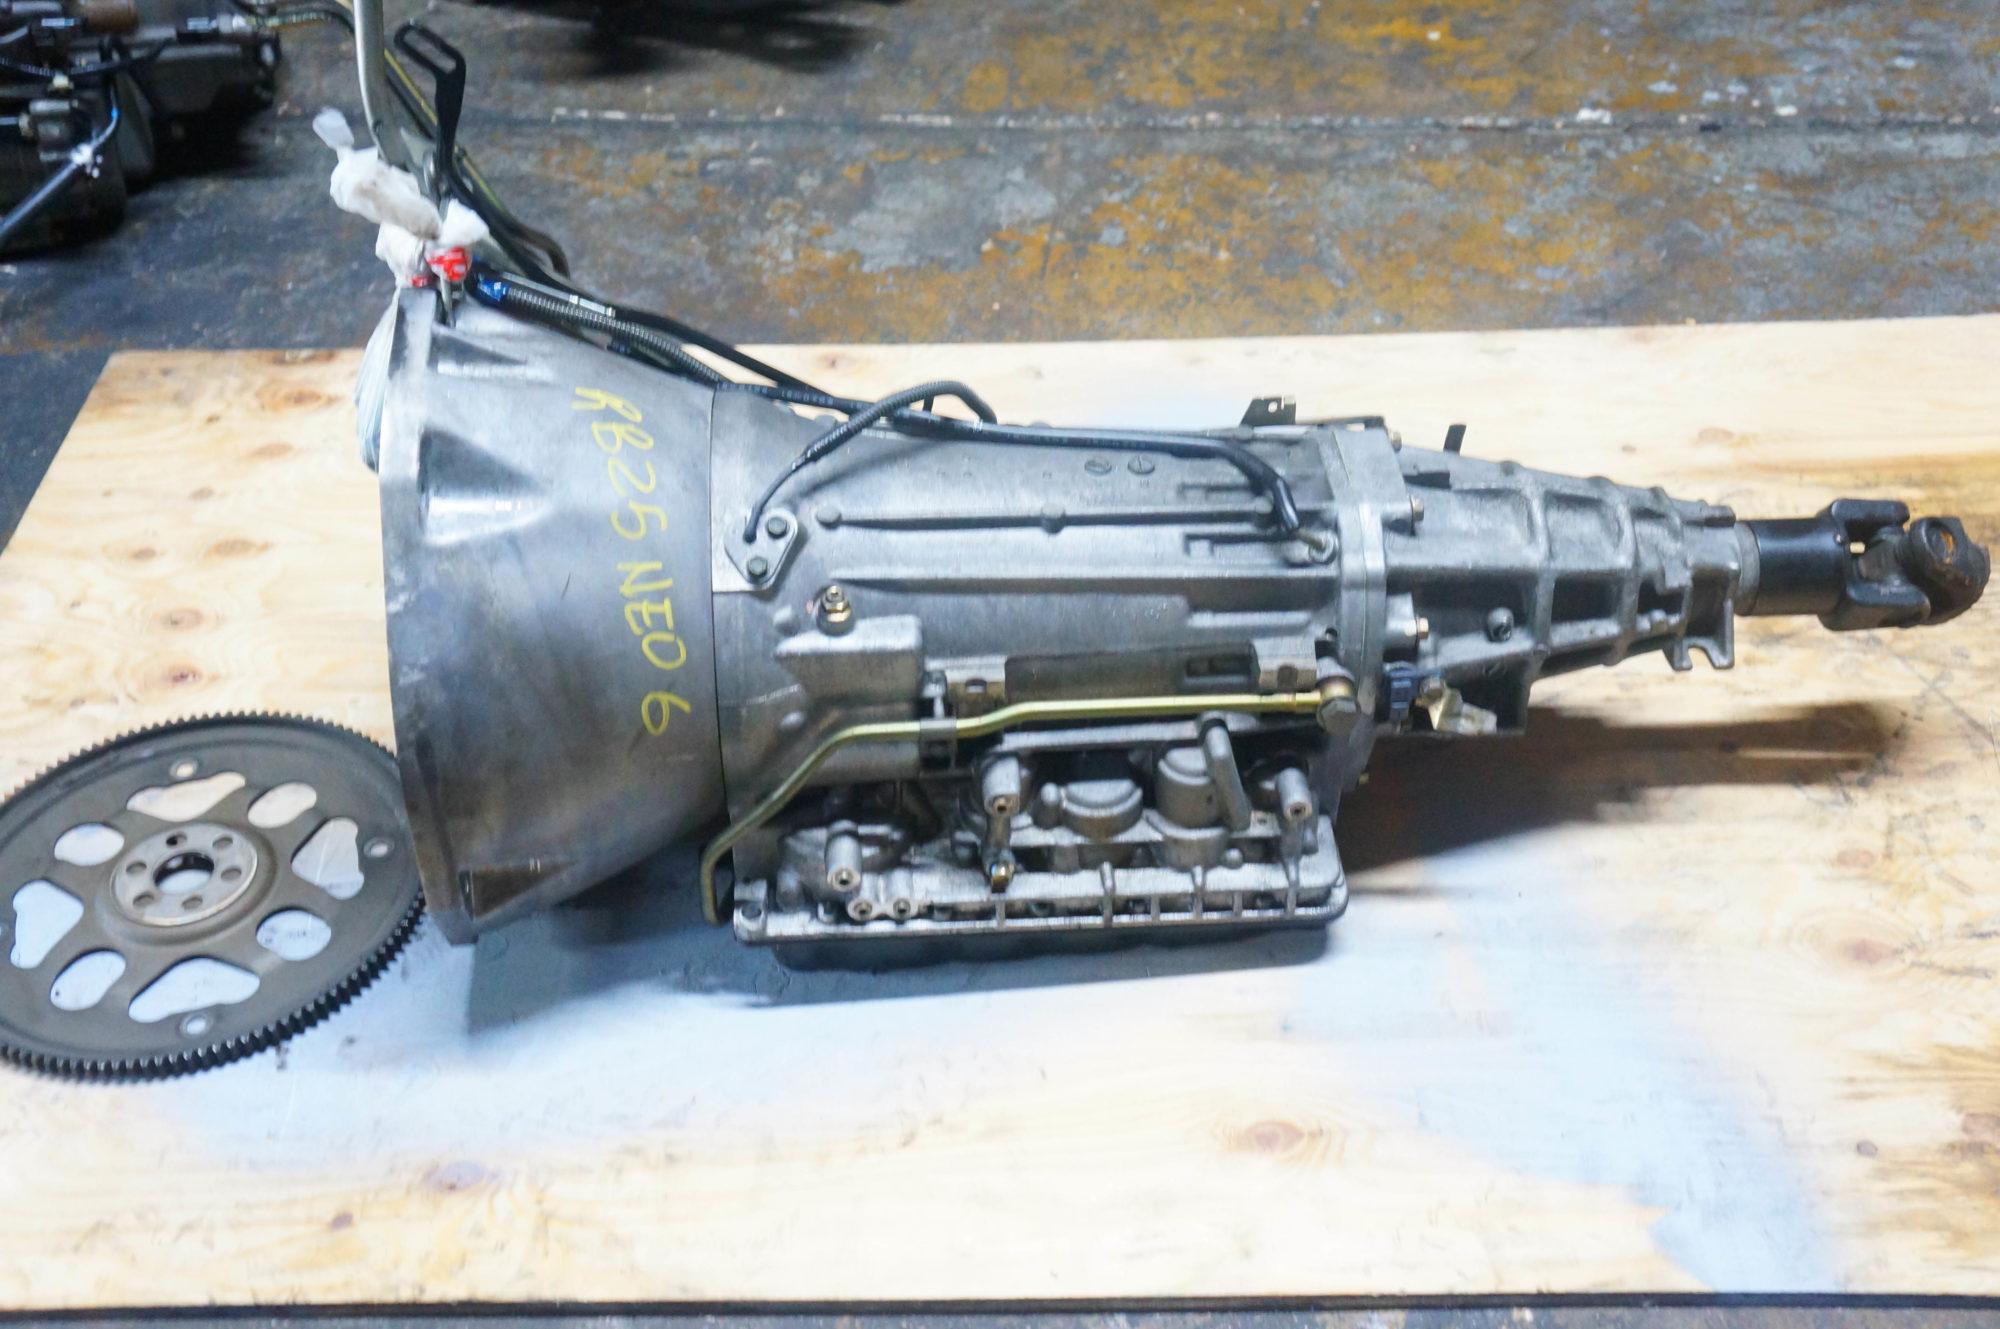 JDM NISSAN RB25 NEO 6 AUTOMATIC TRANSMISSION